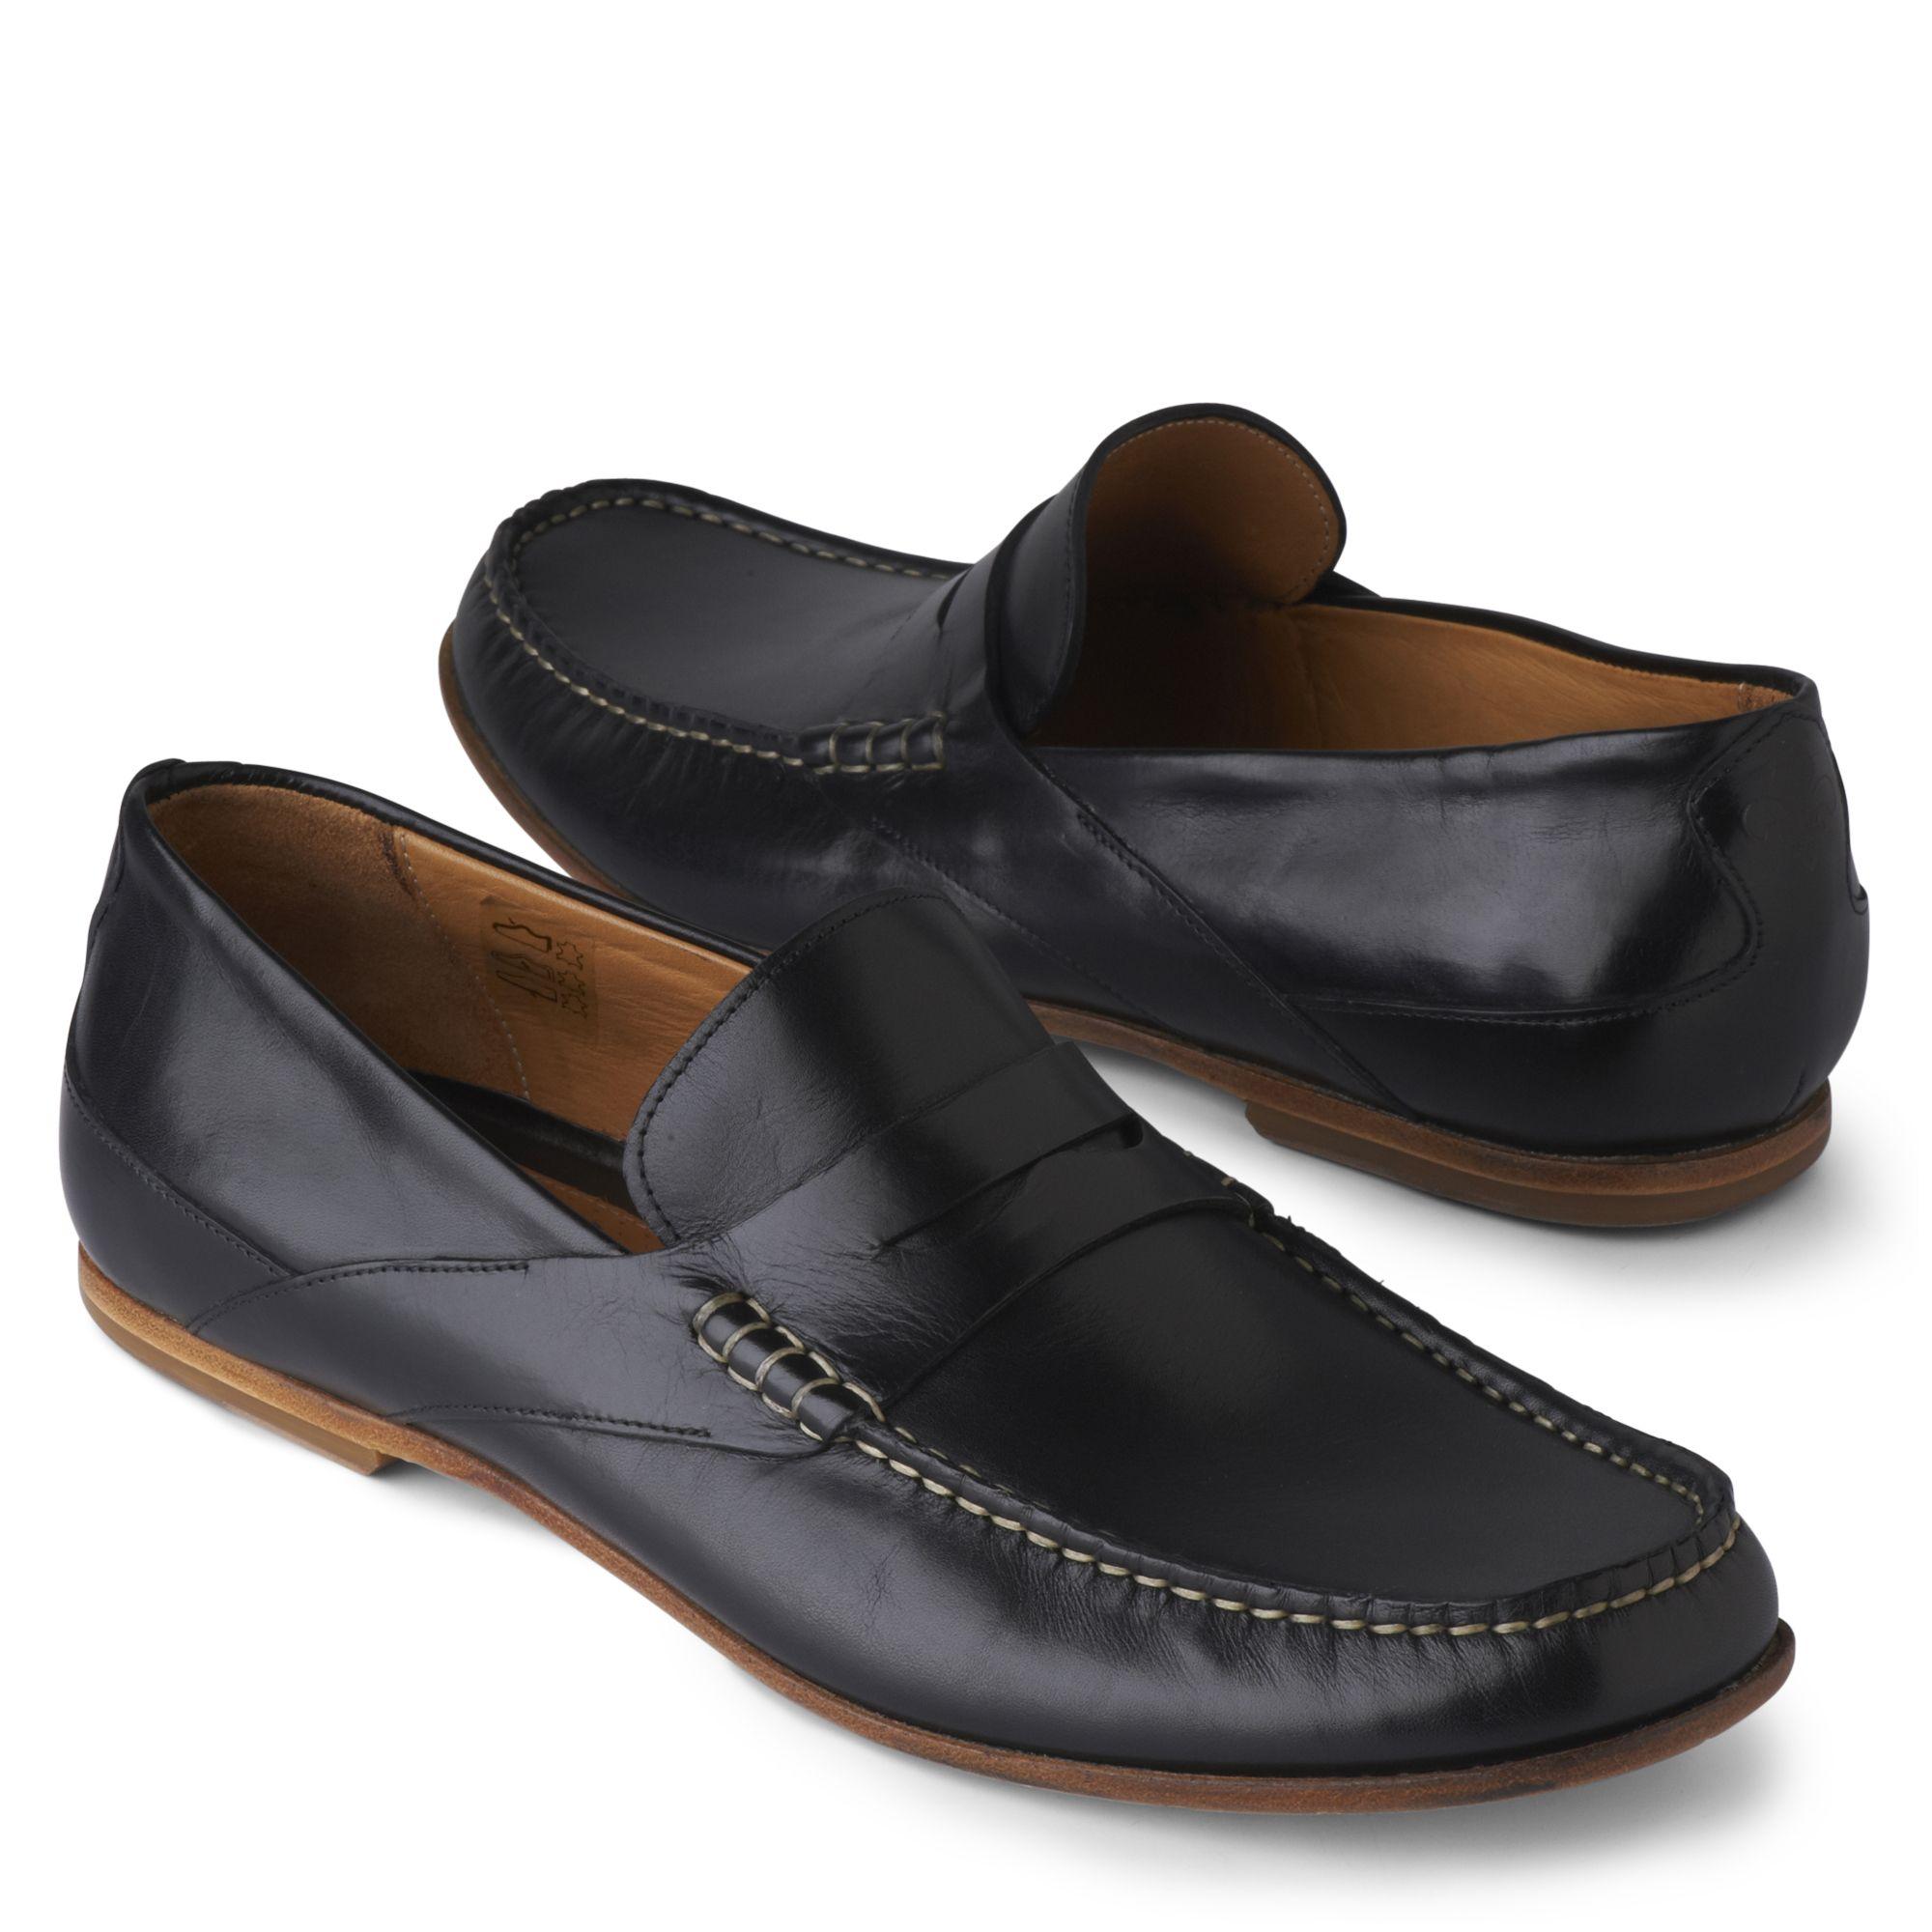 Patrick Cox Shoes Mens